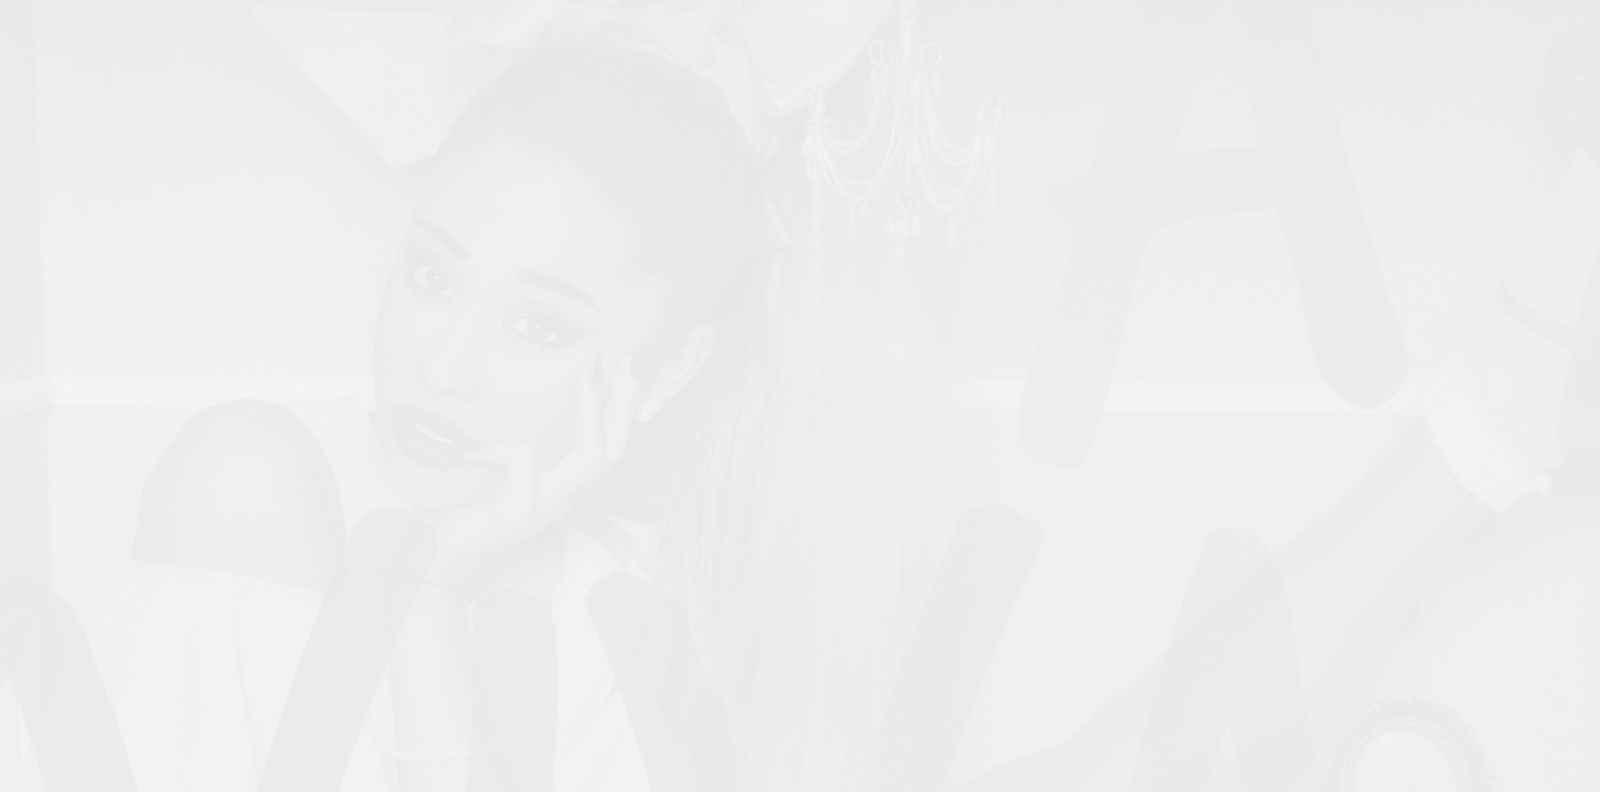 Ариана Гранде победи собствения си Instagram рекорд